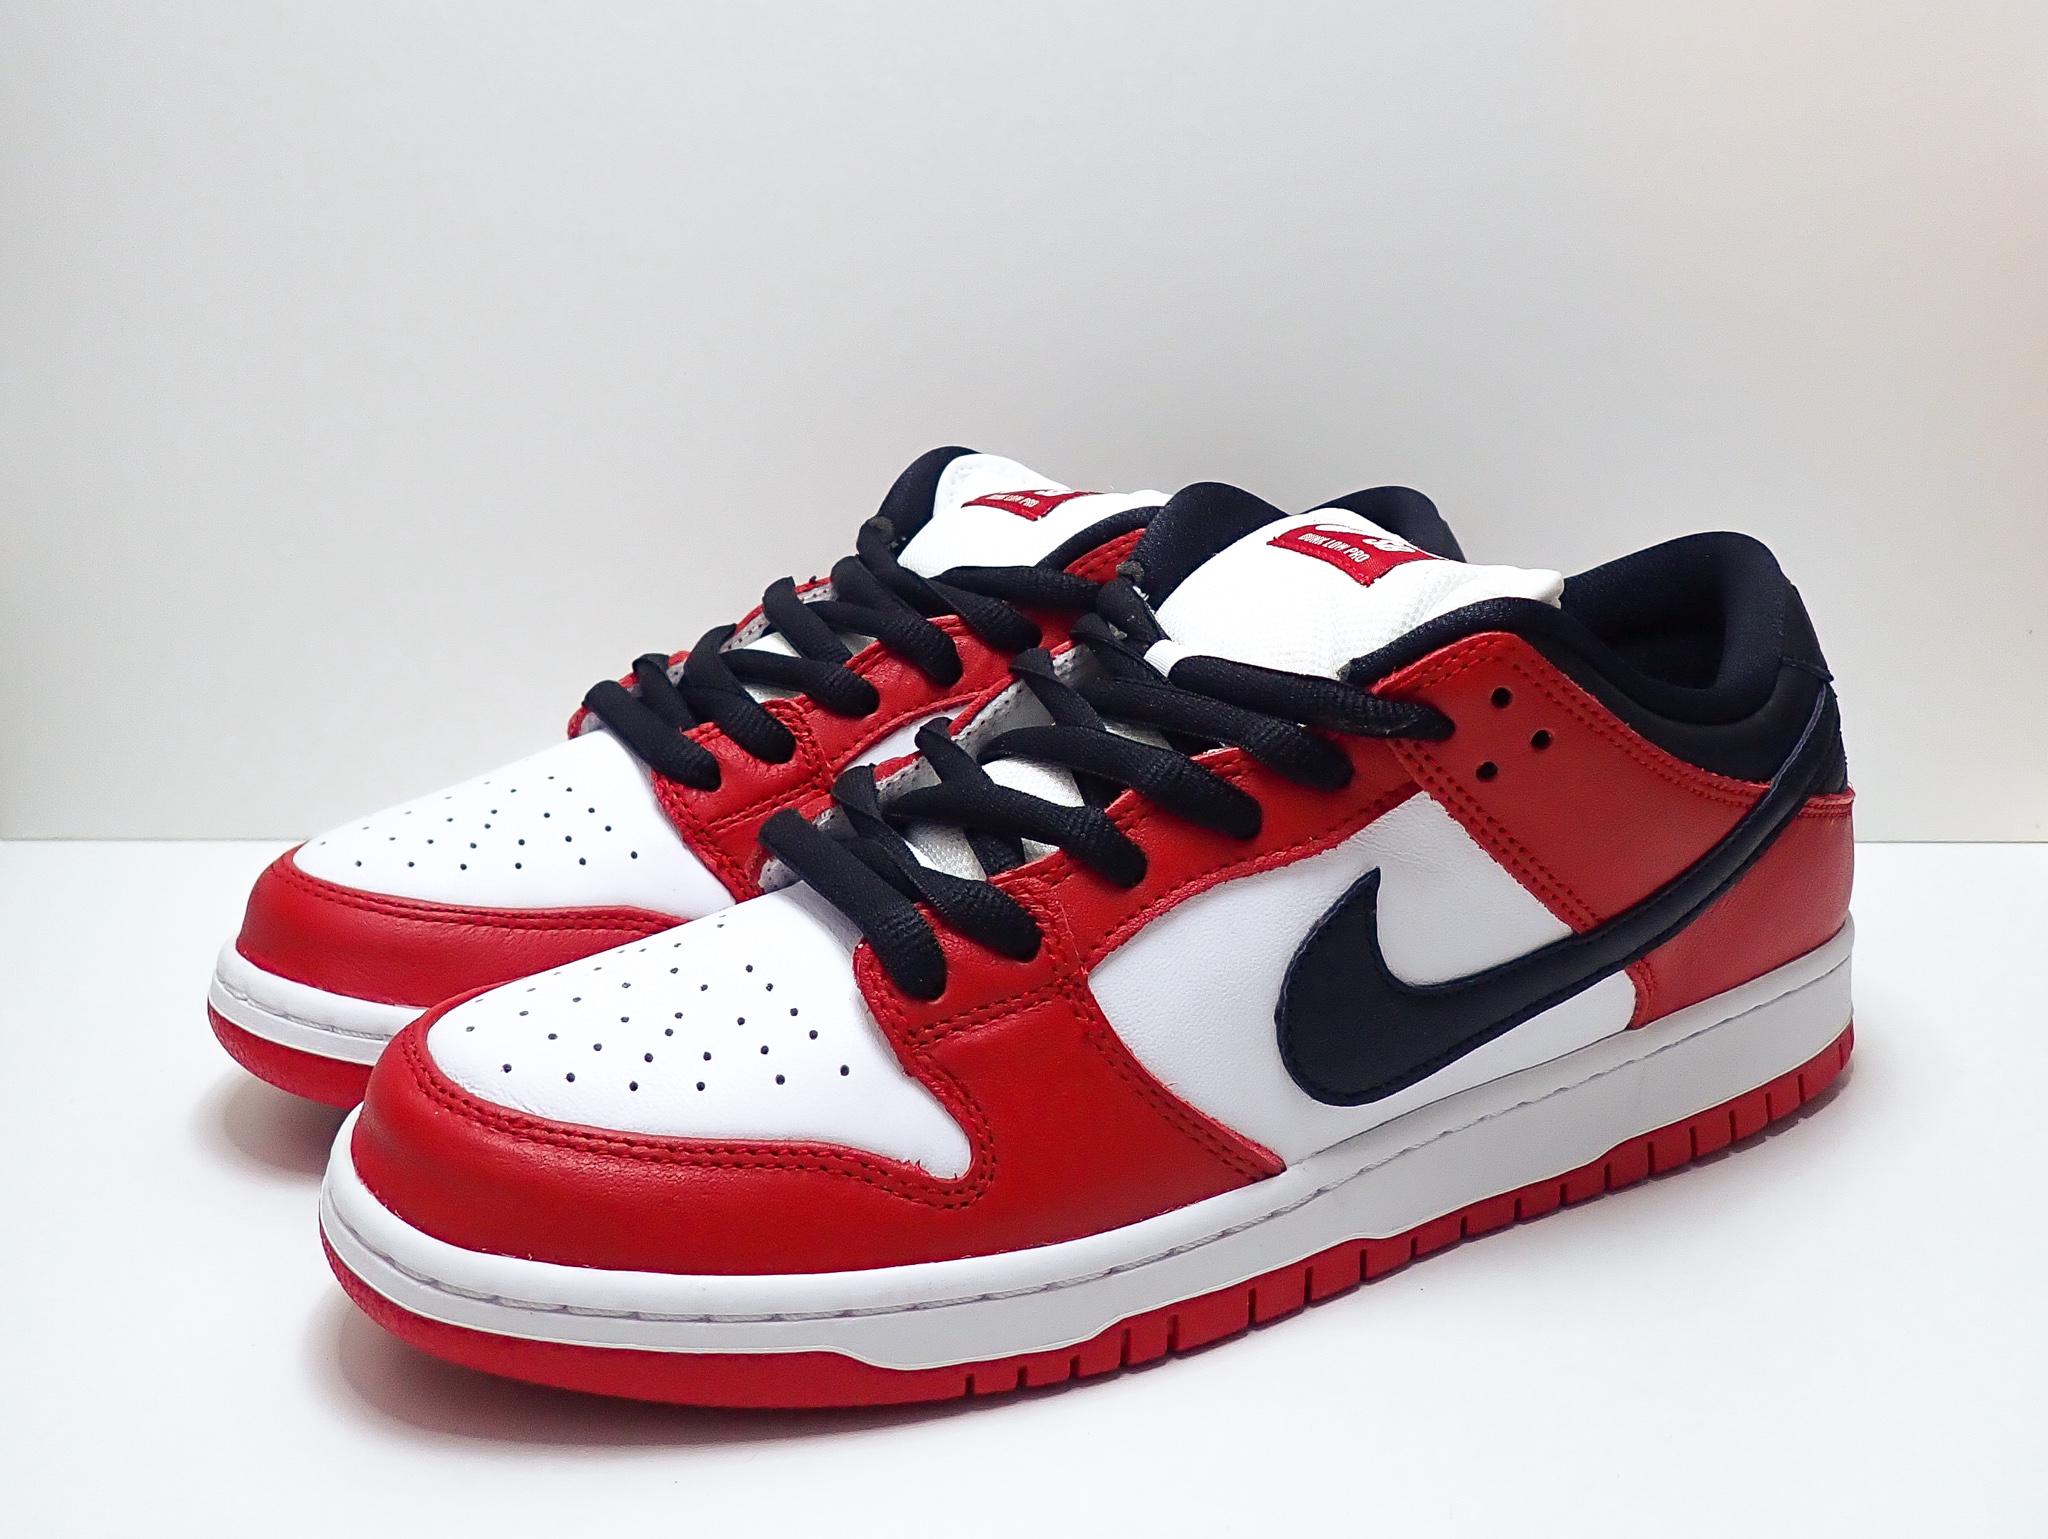 Nike SB Dunk Low J-Pack Chicago